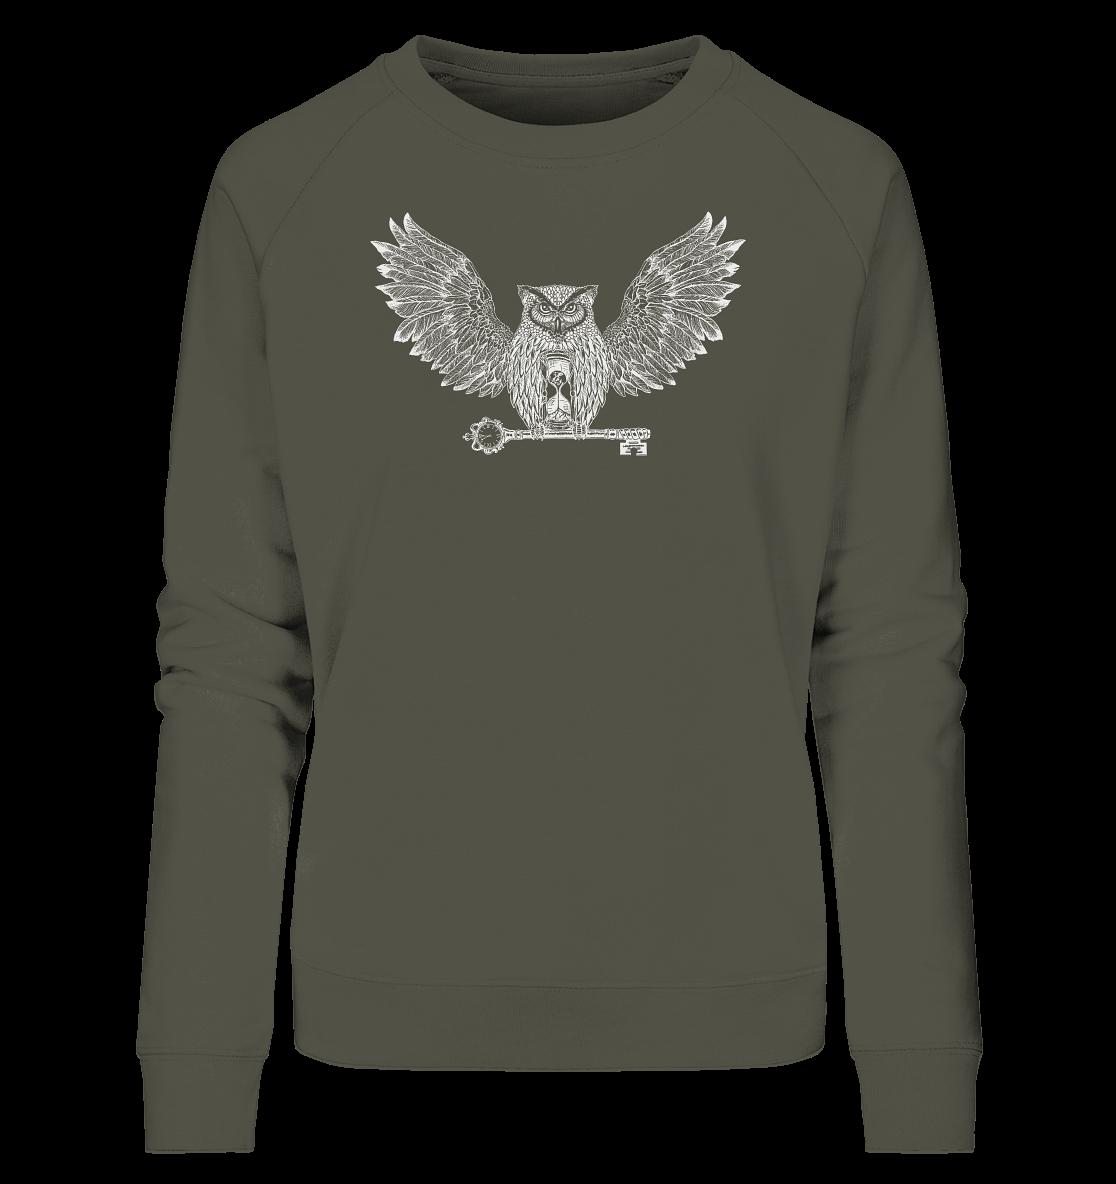 front-ladies-organic-sweatshirt-545348-1116x-4.png